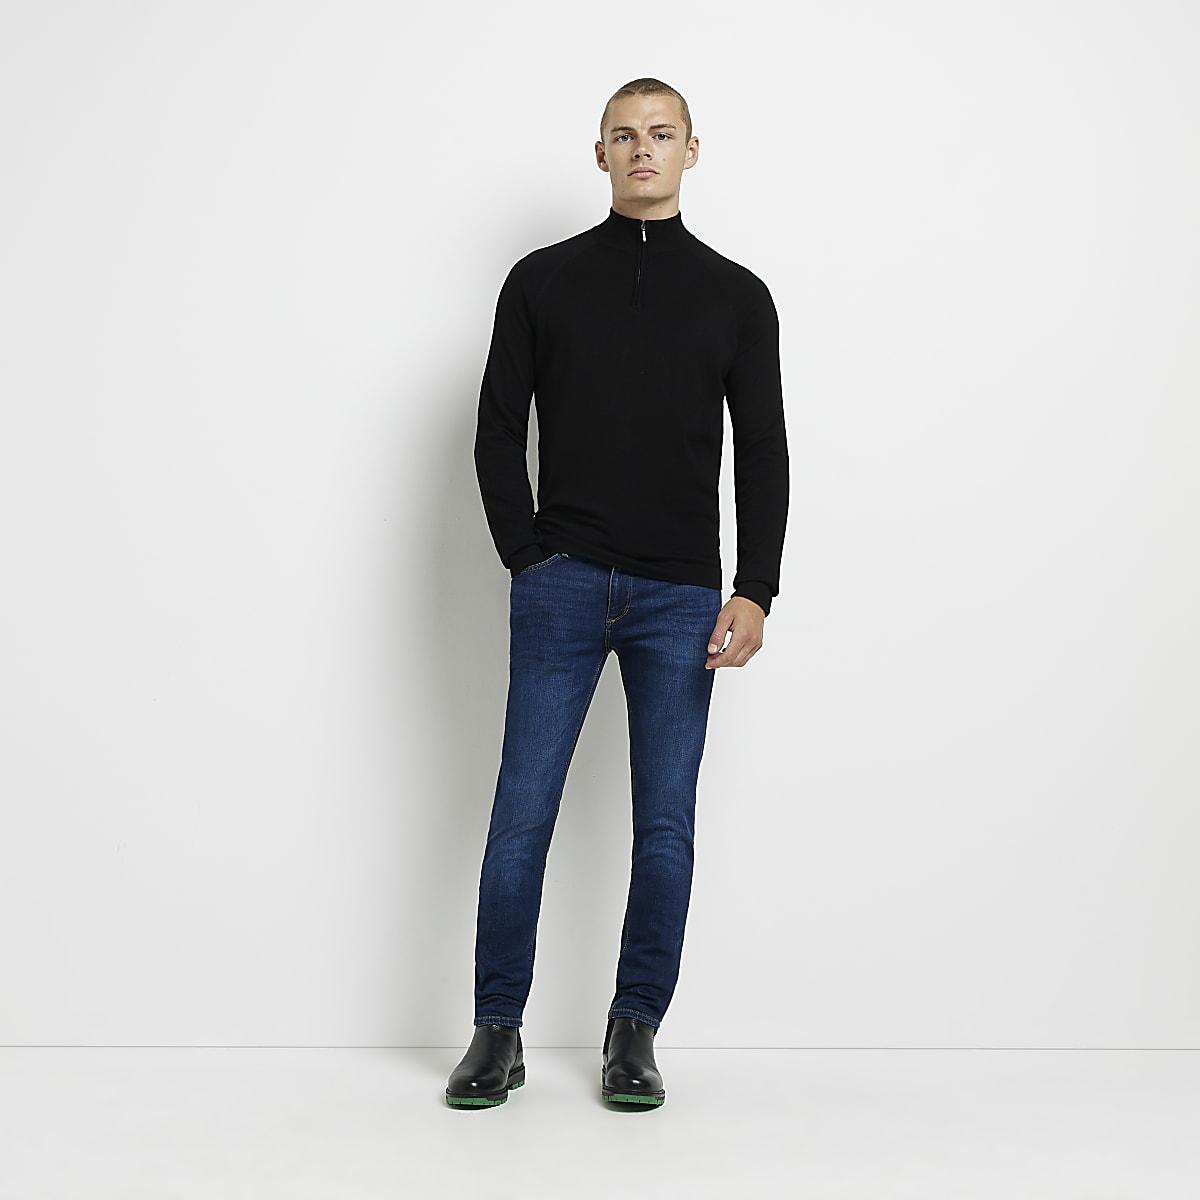 04ec43e2ba Dark Blue Skinny Jeans Mens - The Best Style Jeans